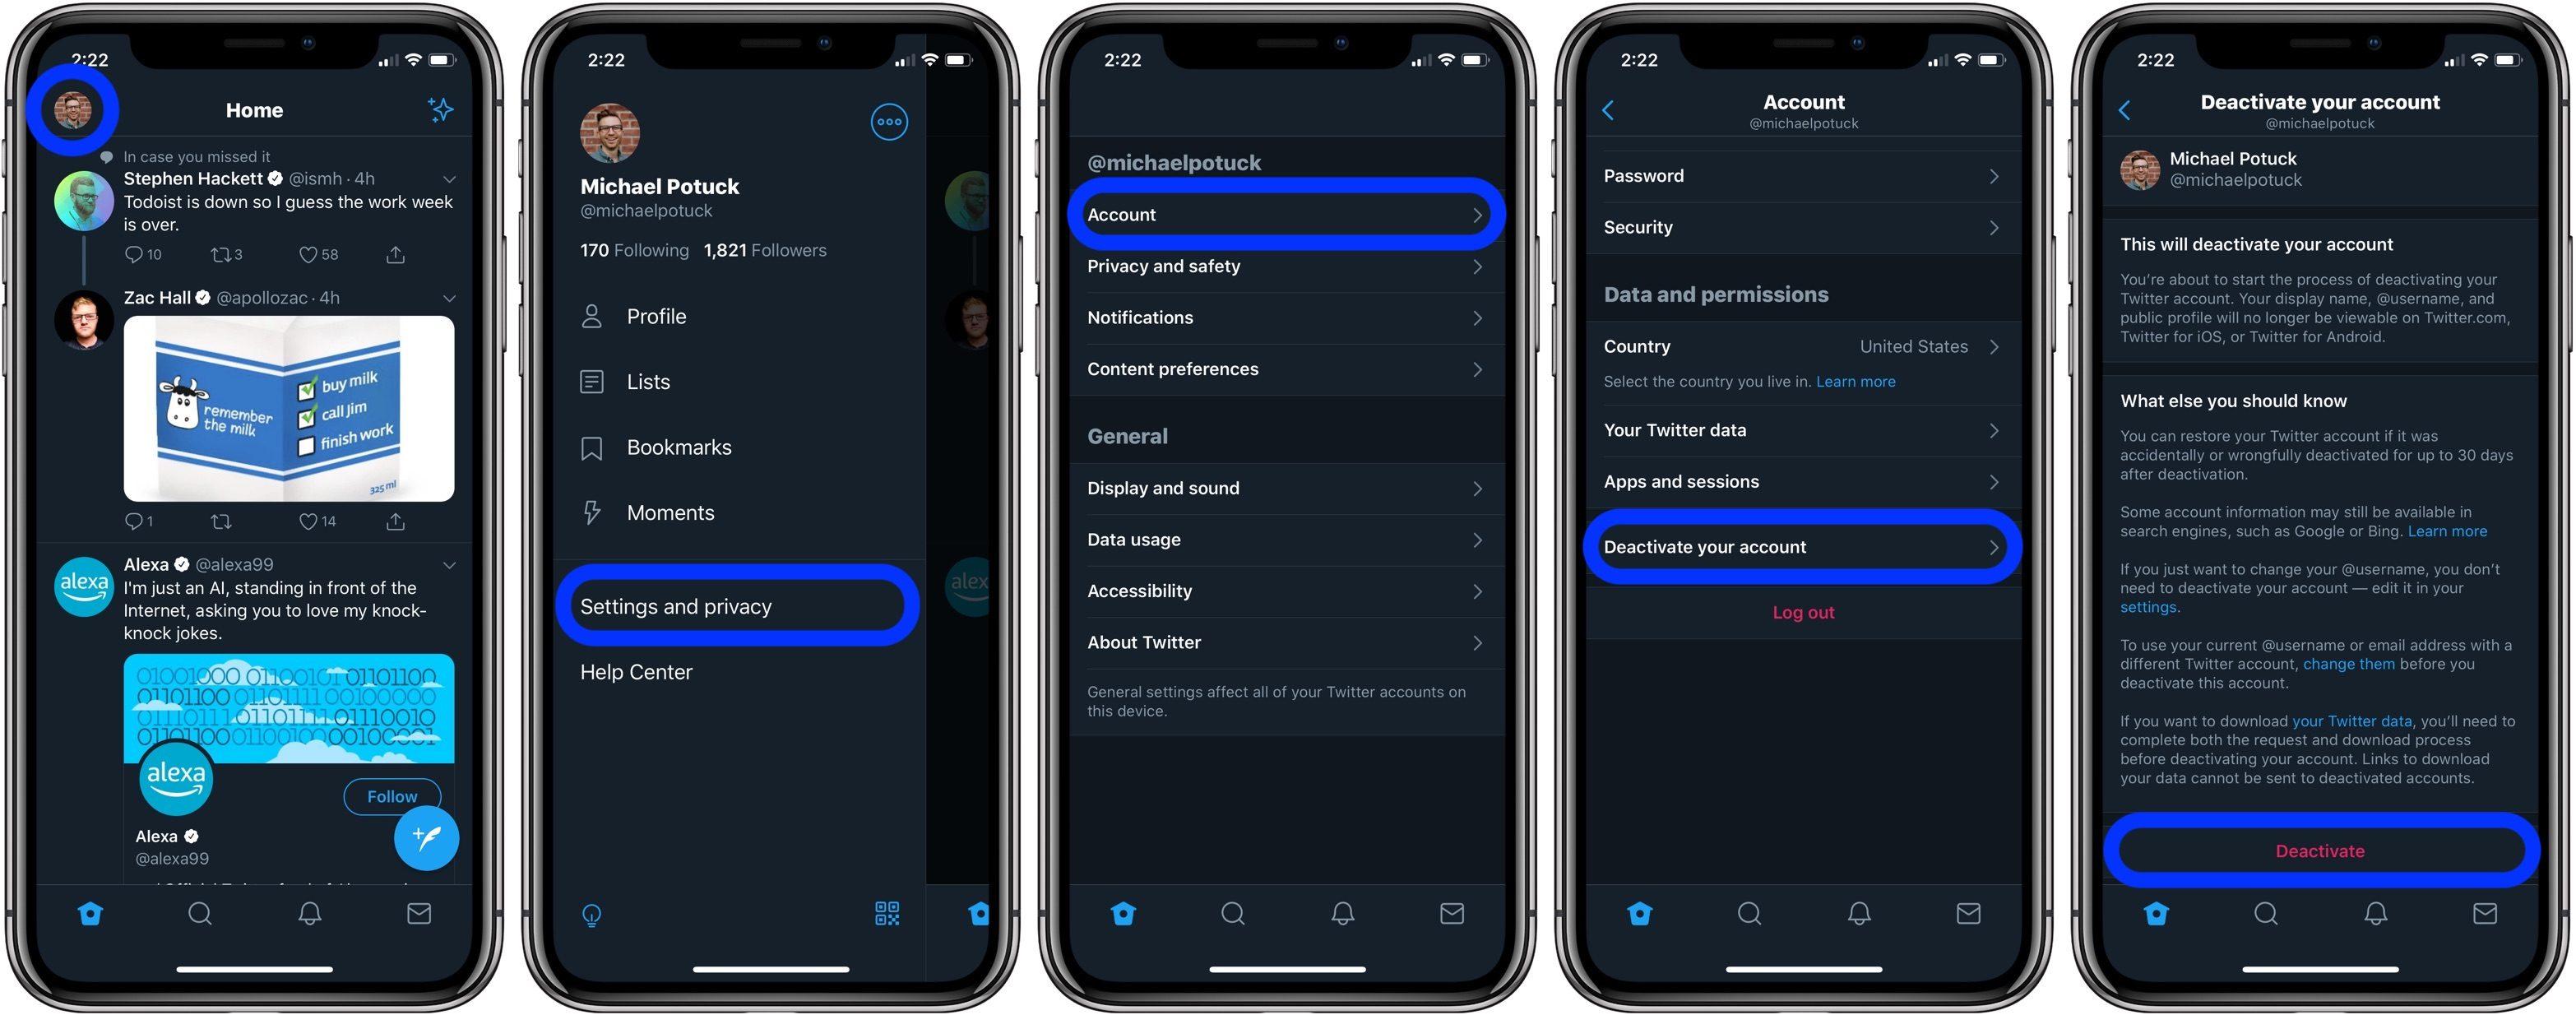 "<span href=""https://9to5mac.com/2019/08/12/delete-twitter-account-iphone/"">¿Cómo eliminar tu cuenta de Twitter en iPhone</a>"